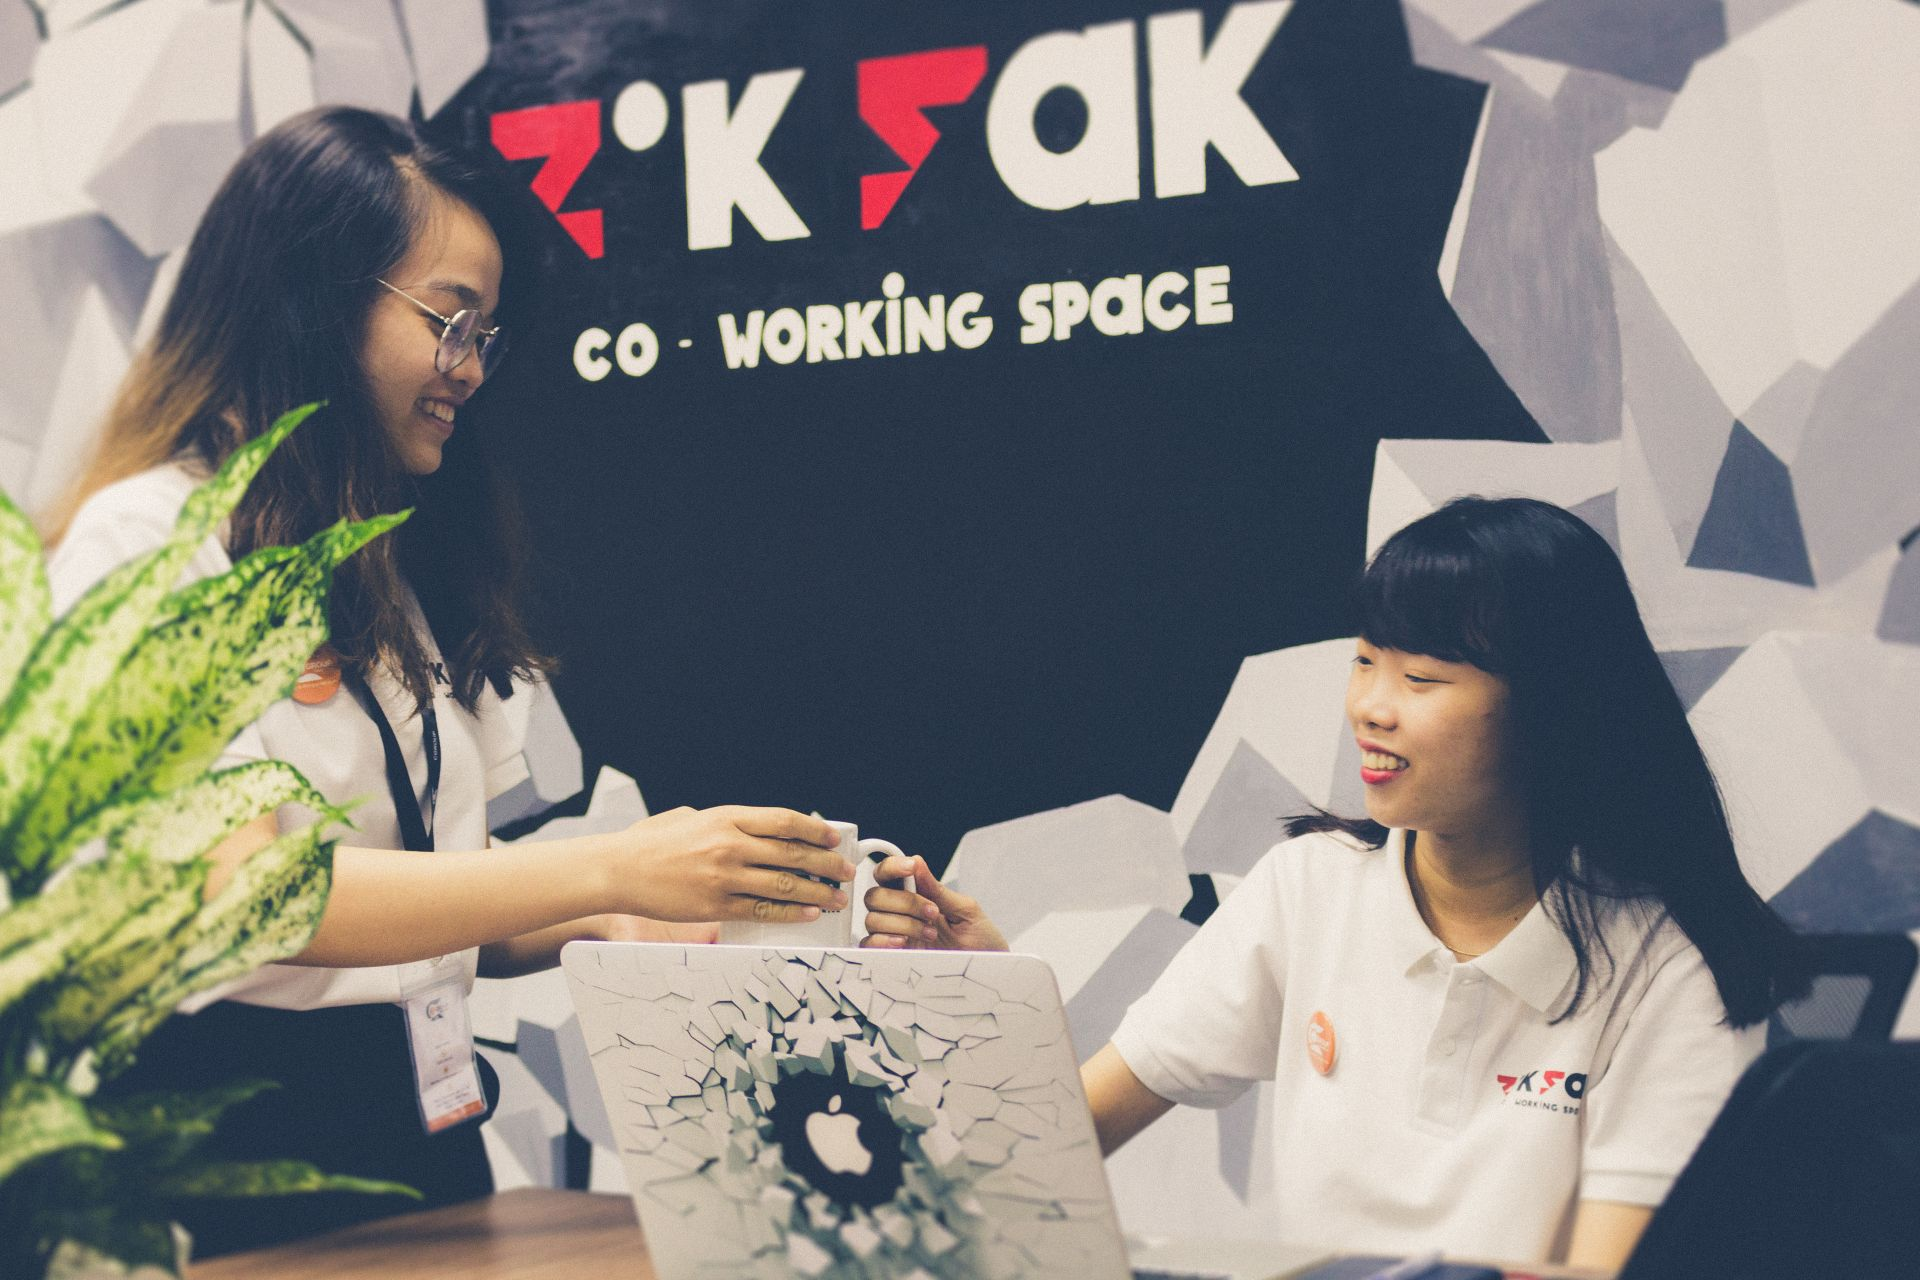 ZikZak co-working space 1, Ho Chi Minh City